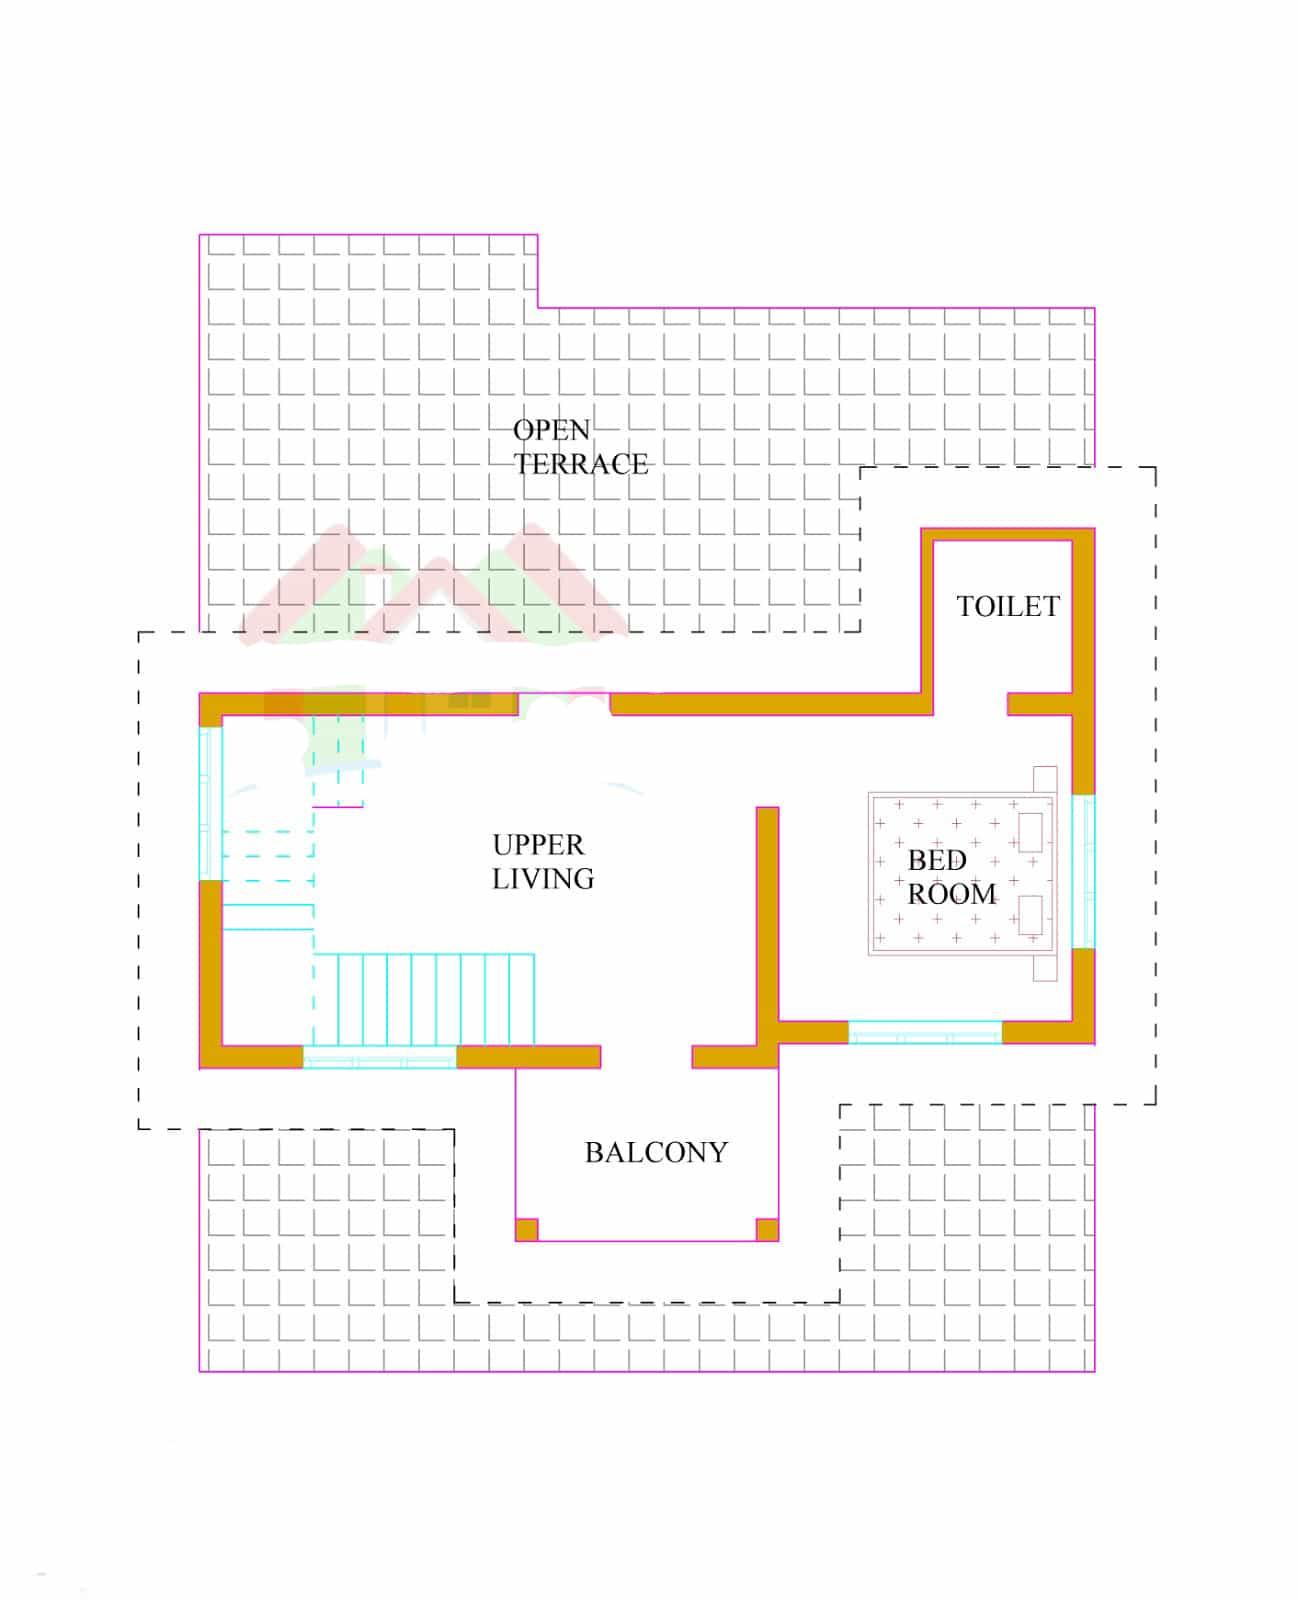 1500 3000 sq ft keralahouseplanner com 2226 house design with kerala - Kerala House Plans Ground Floor First Floor Plan